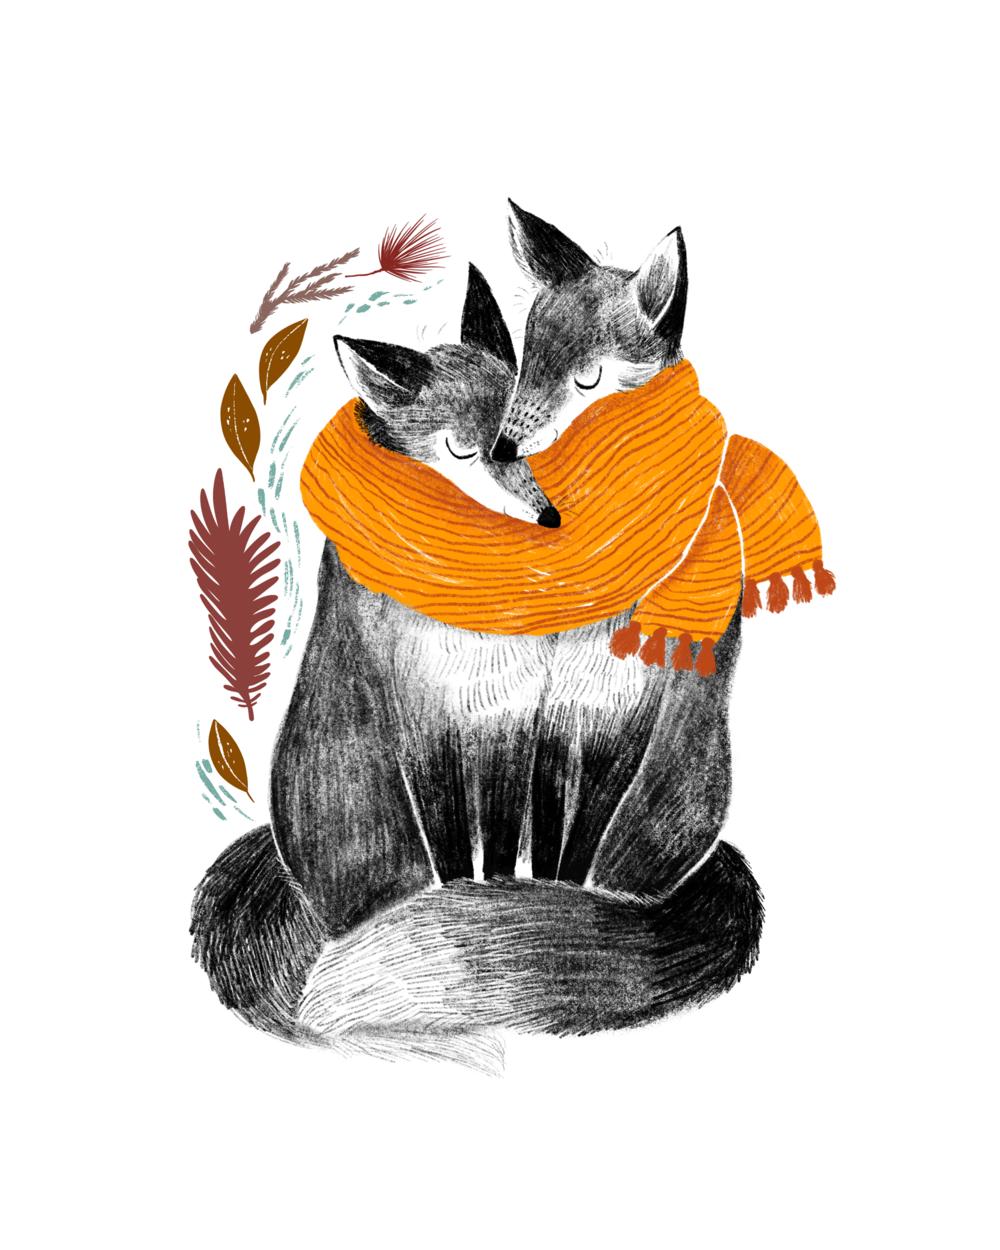 Snuggling Foxes // Digital illustration, 2019